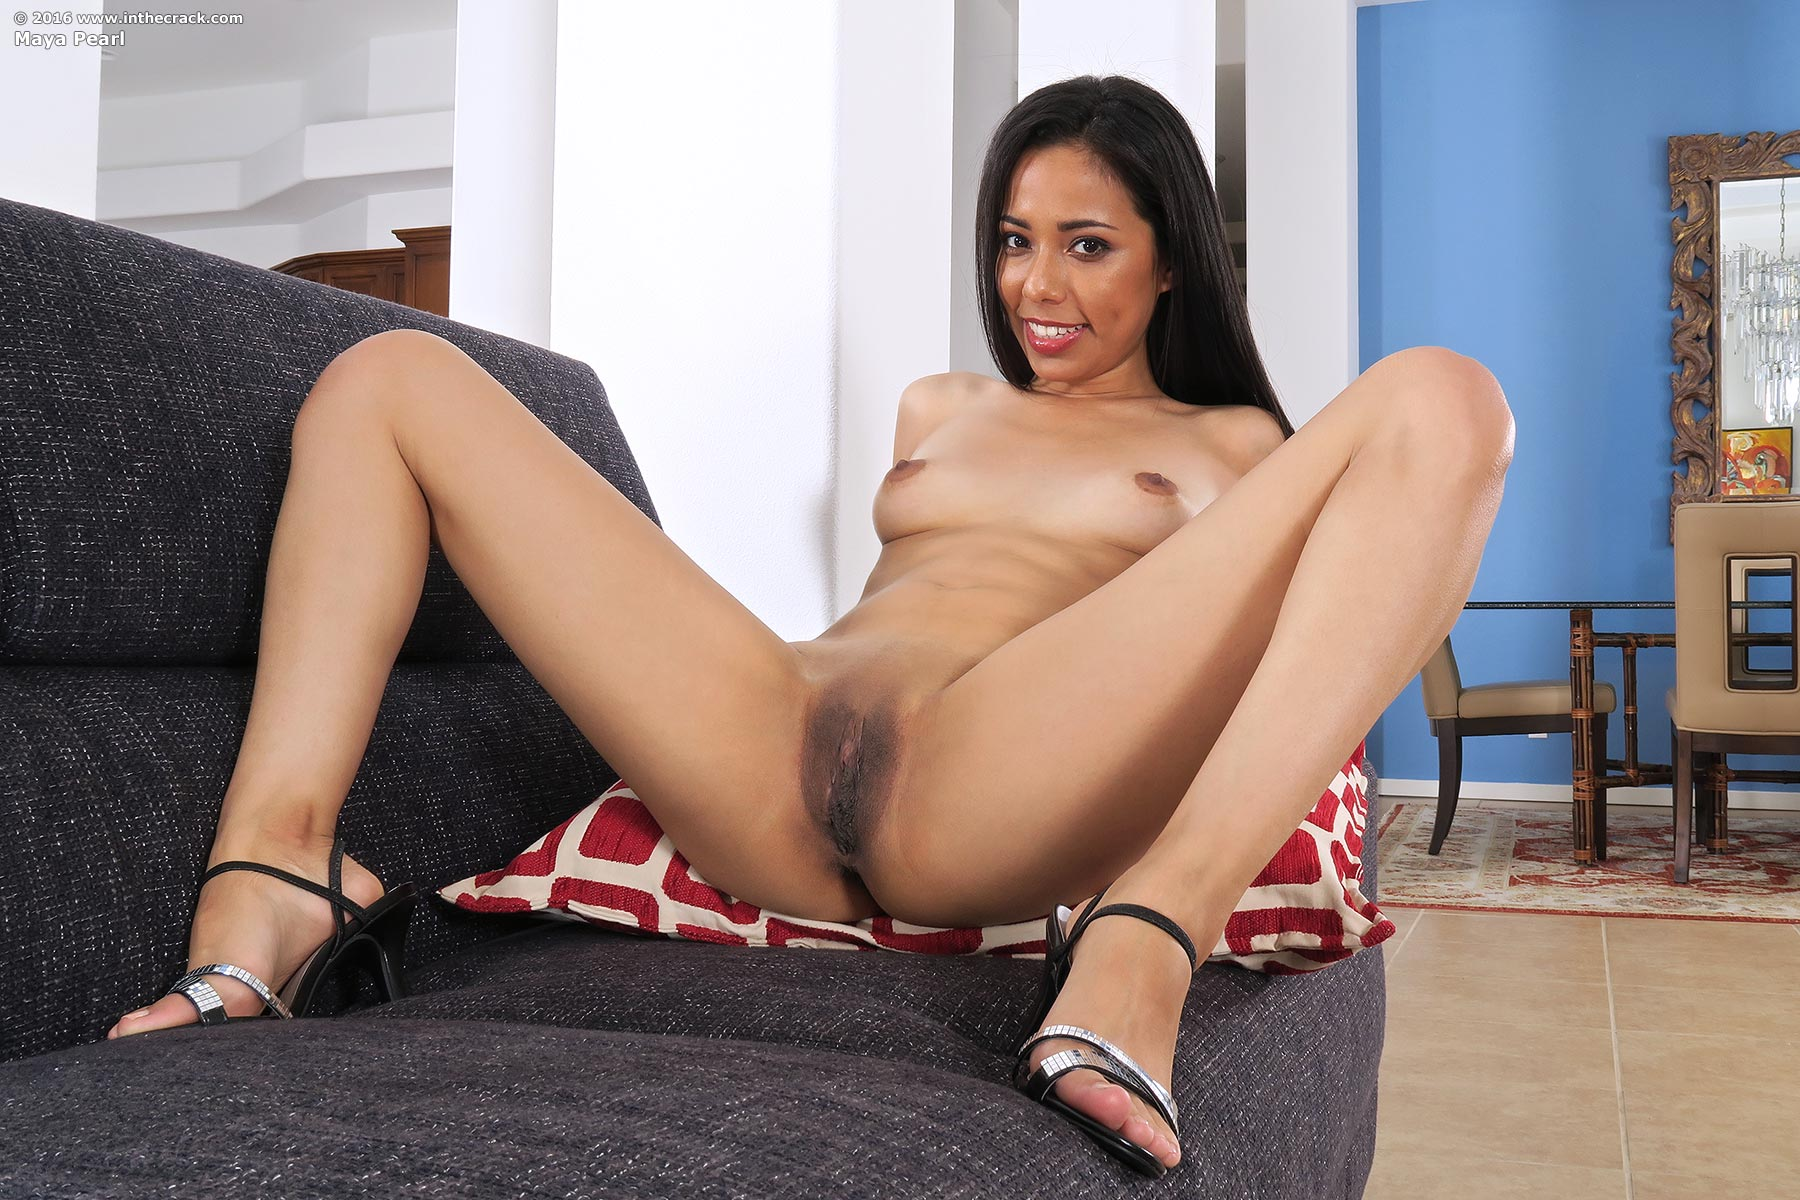 pussy-latin-model-hot-sexy-girl-com